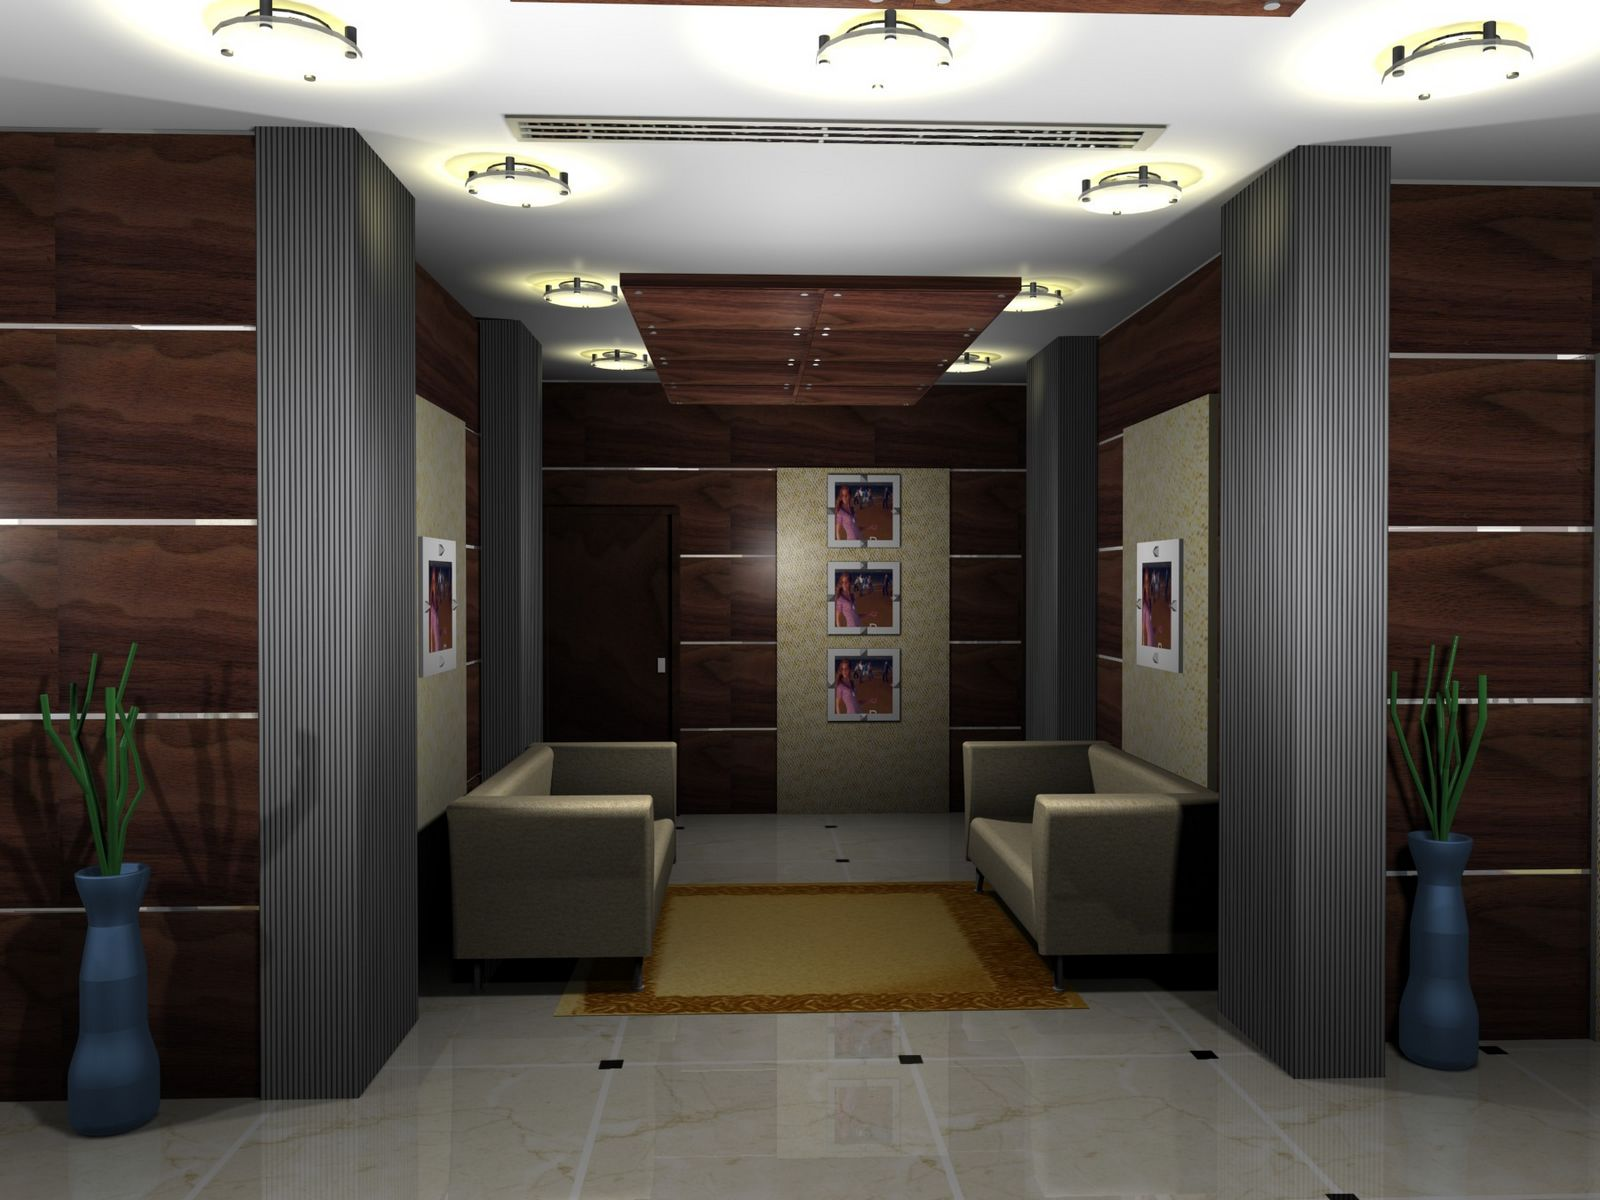 Gurooji design mont royal hotel lobby design for Design hotel lizum 1600